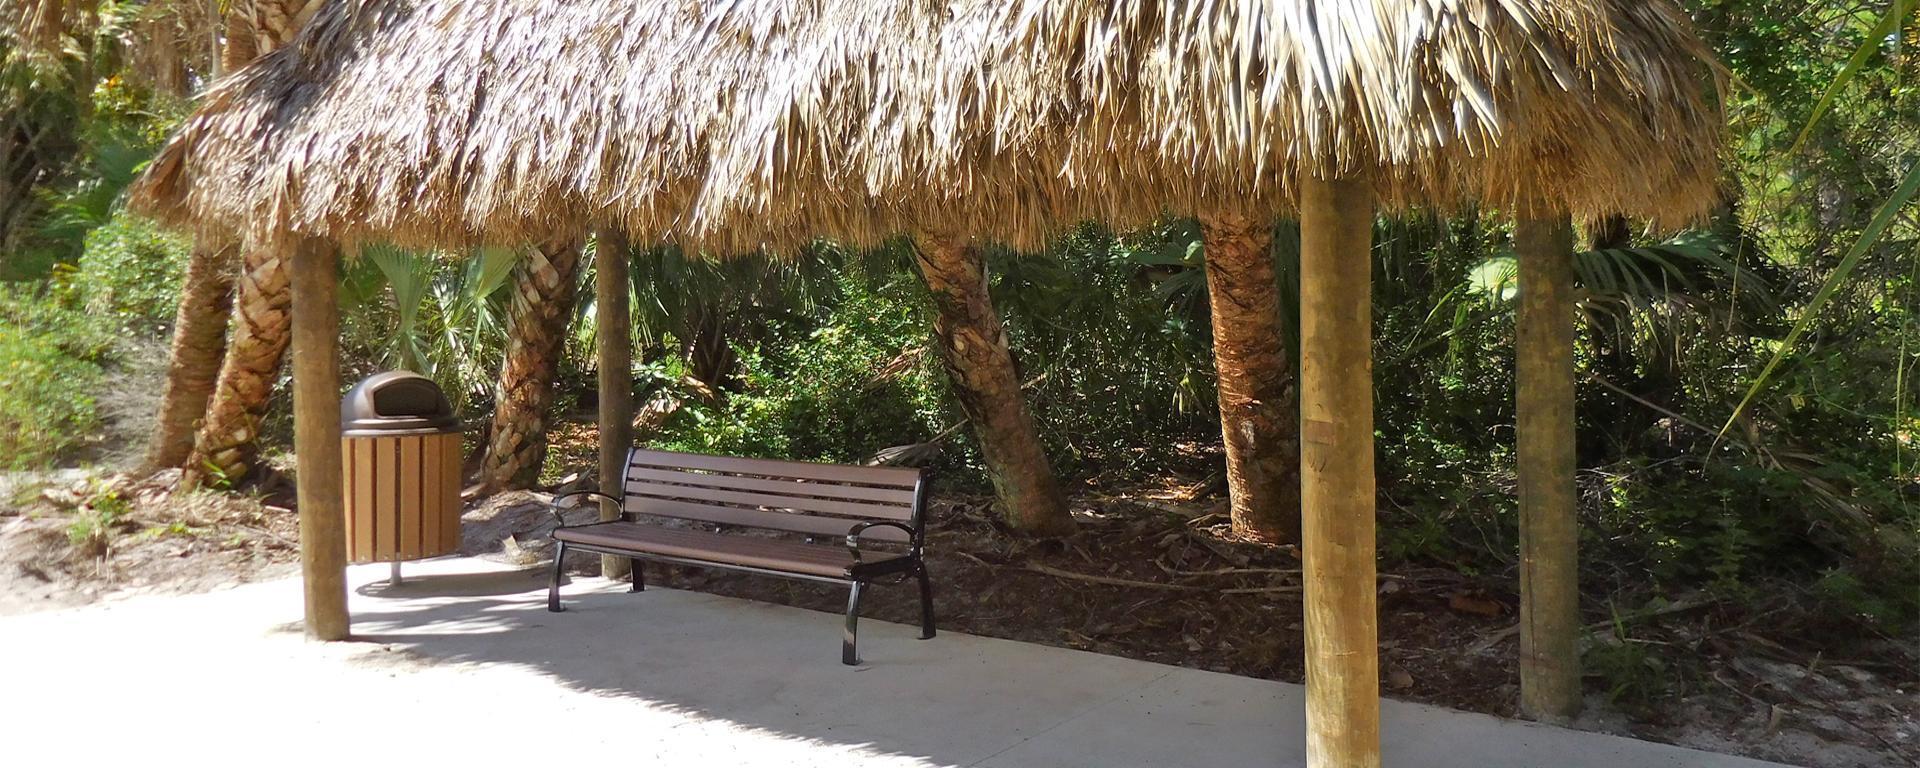 Chickee hut at Gomez Preserve